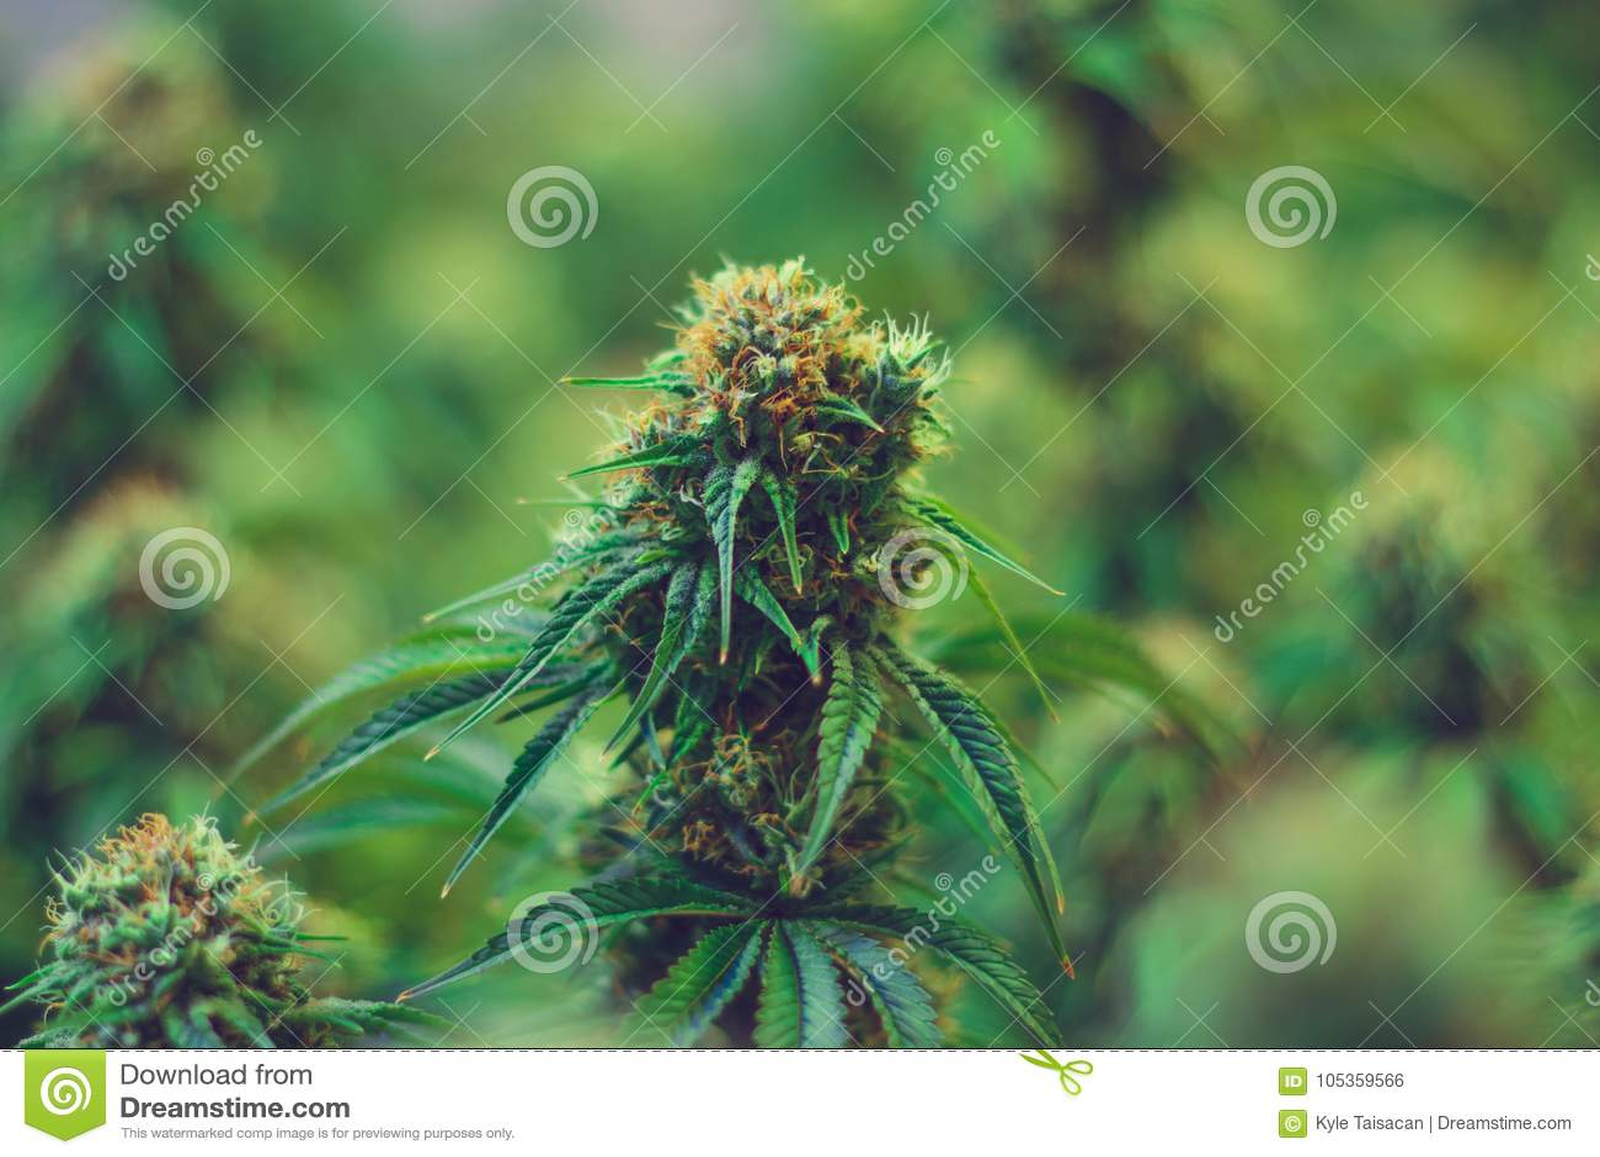 Legal marijuana agriculture for medicinal purposes